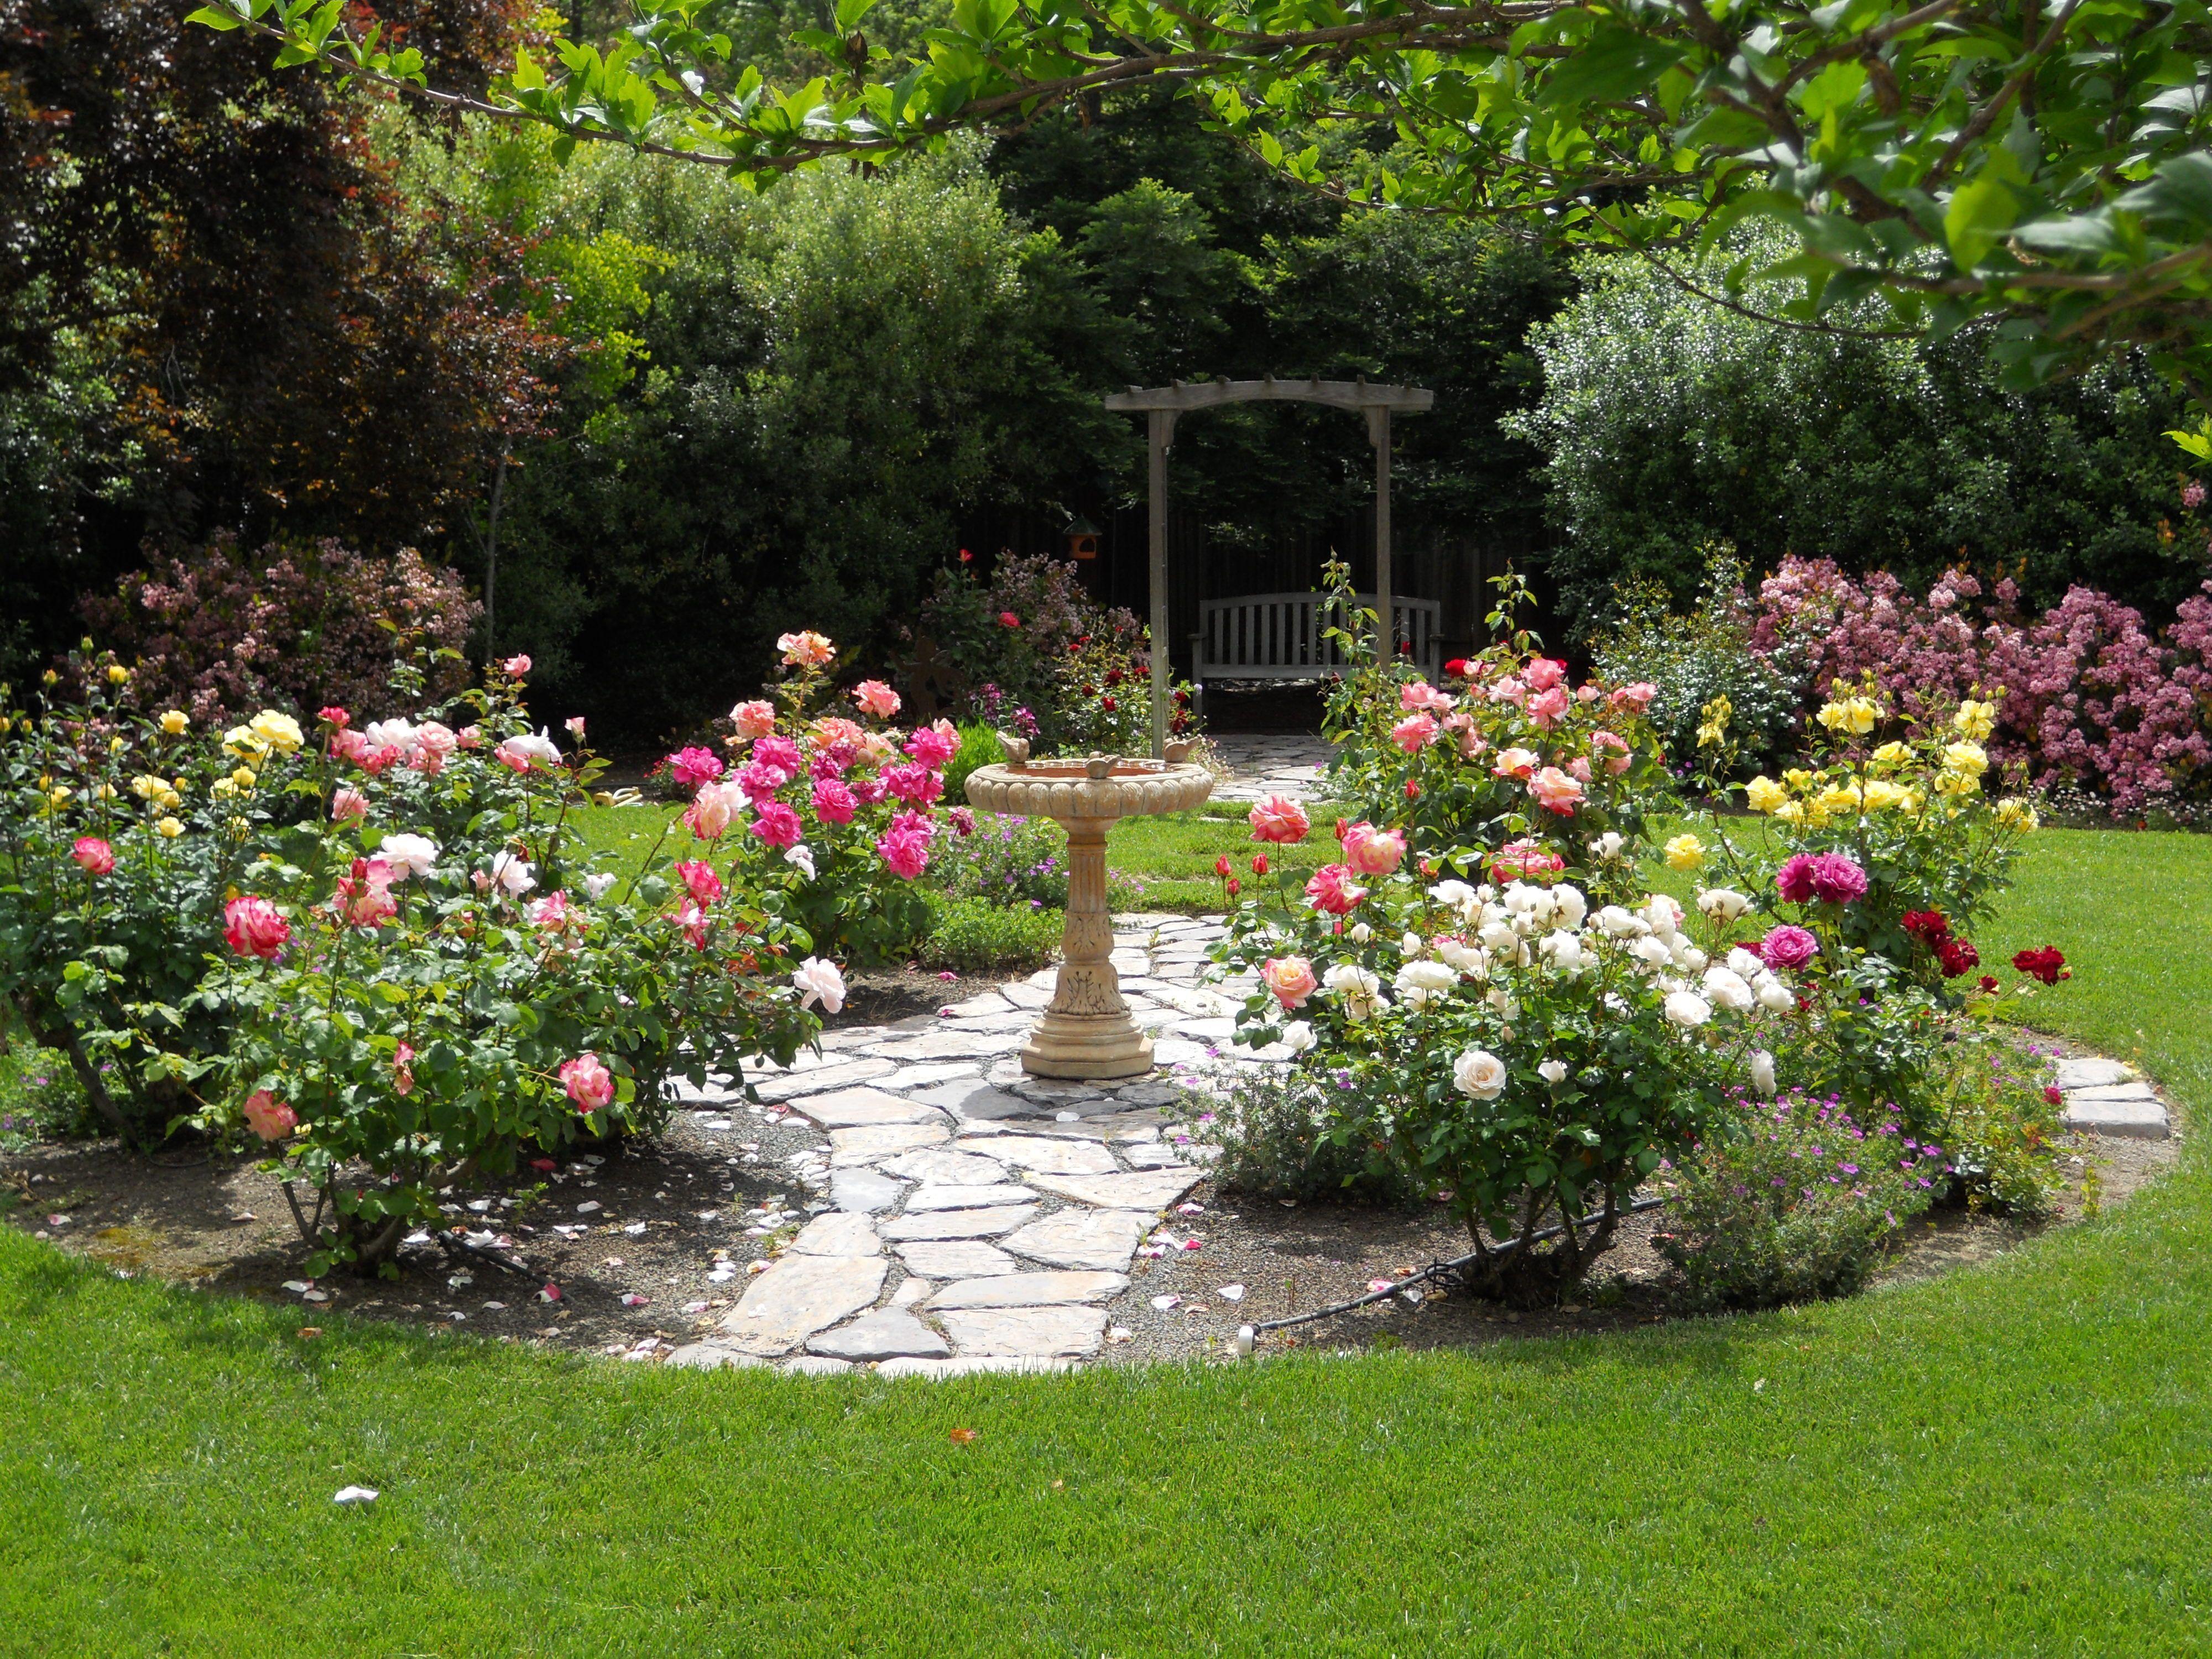 10 Shrub Garden Ideas Brilliant As Well As Lovely Rose Garden Design Backyard Garden Design Garden Design